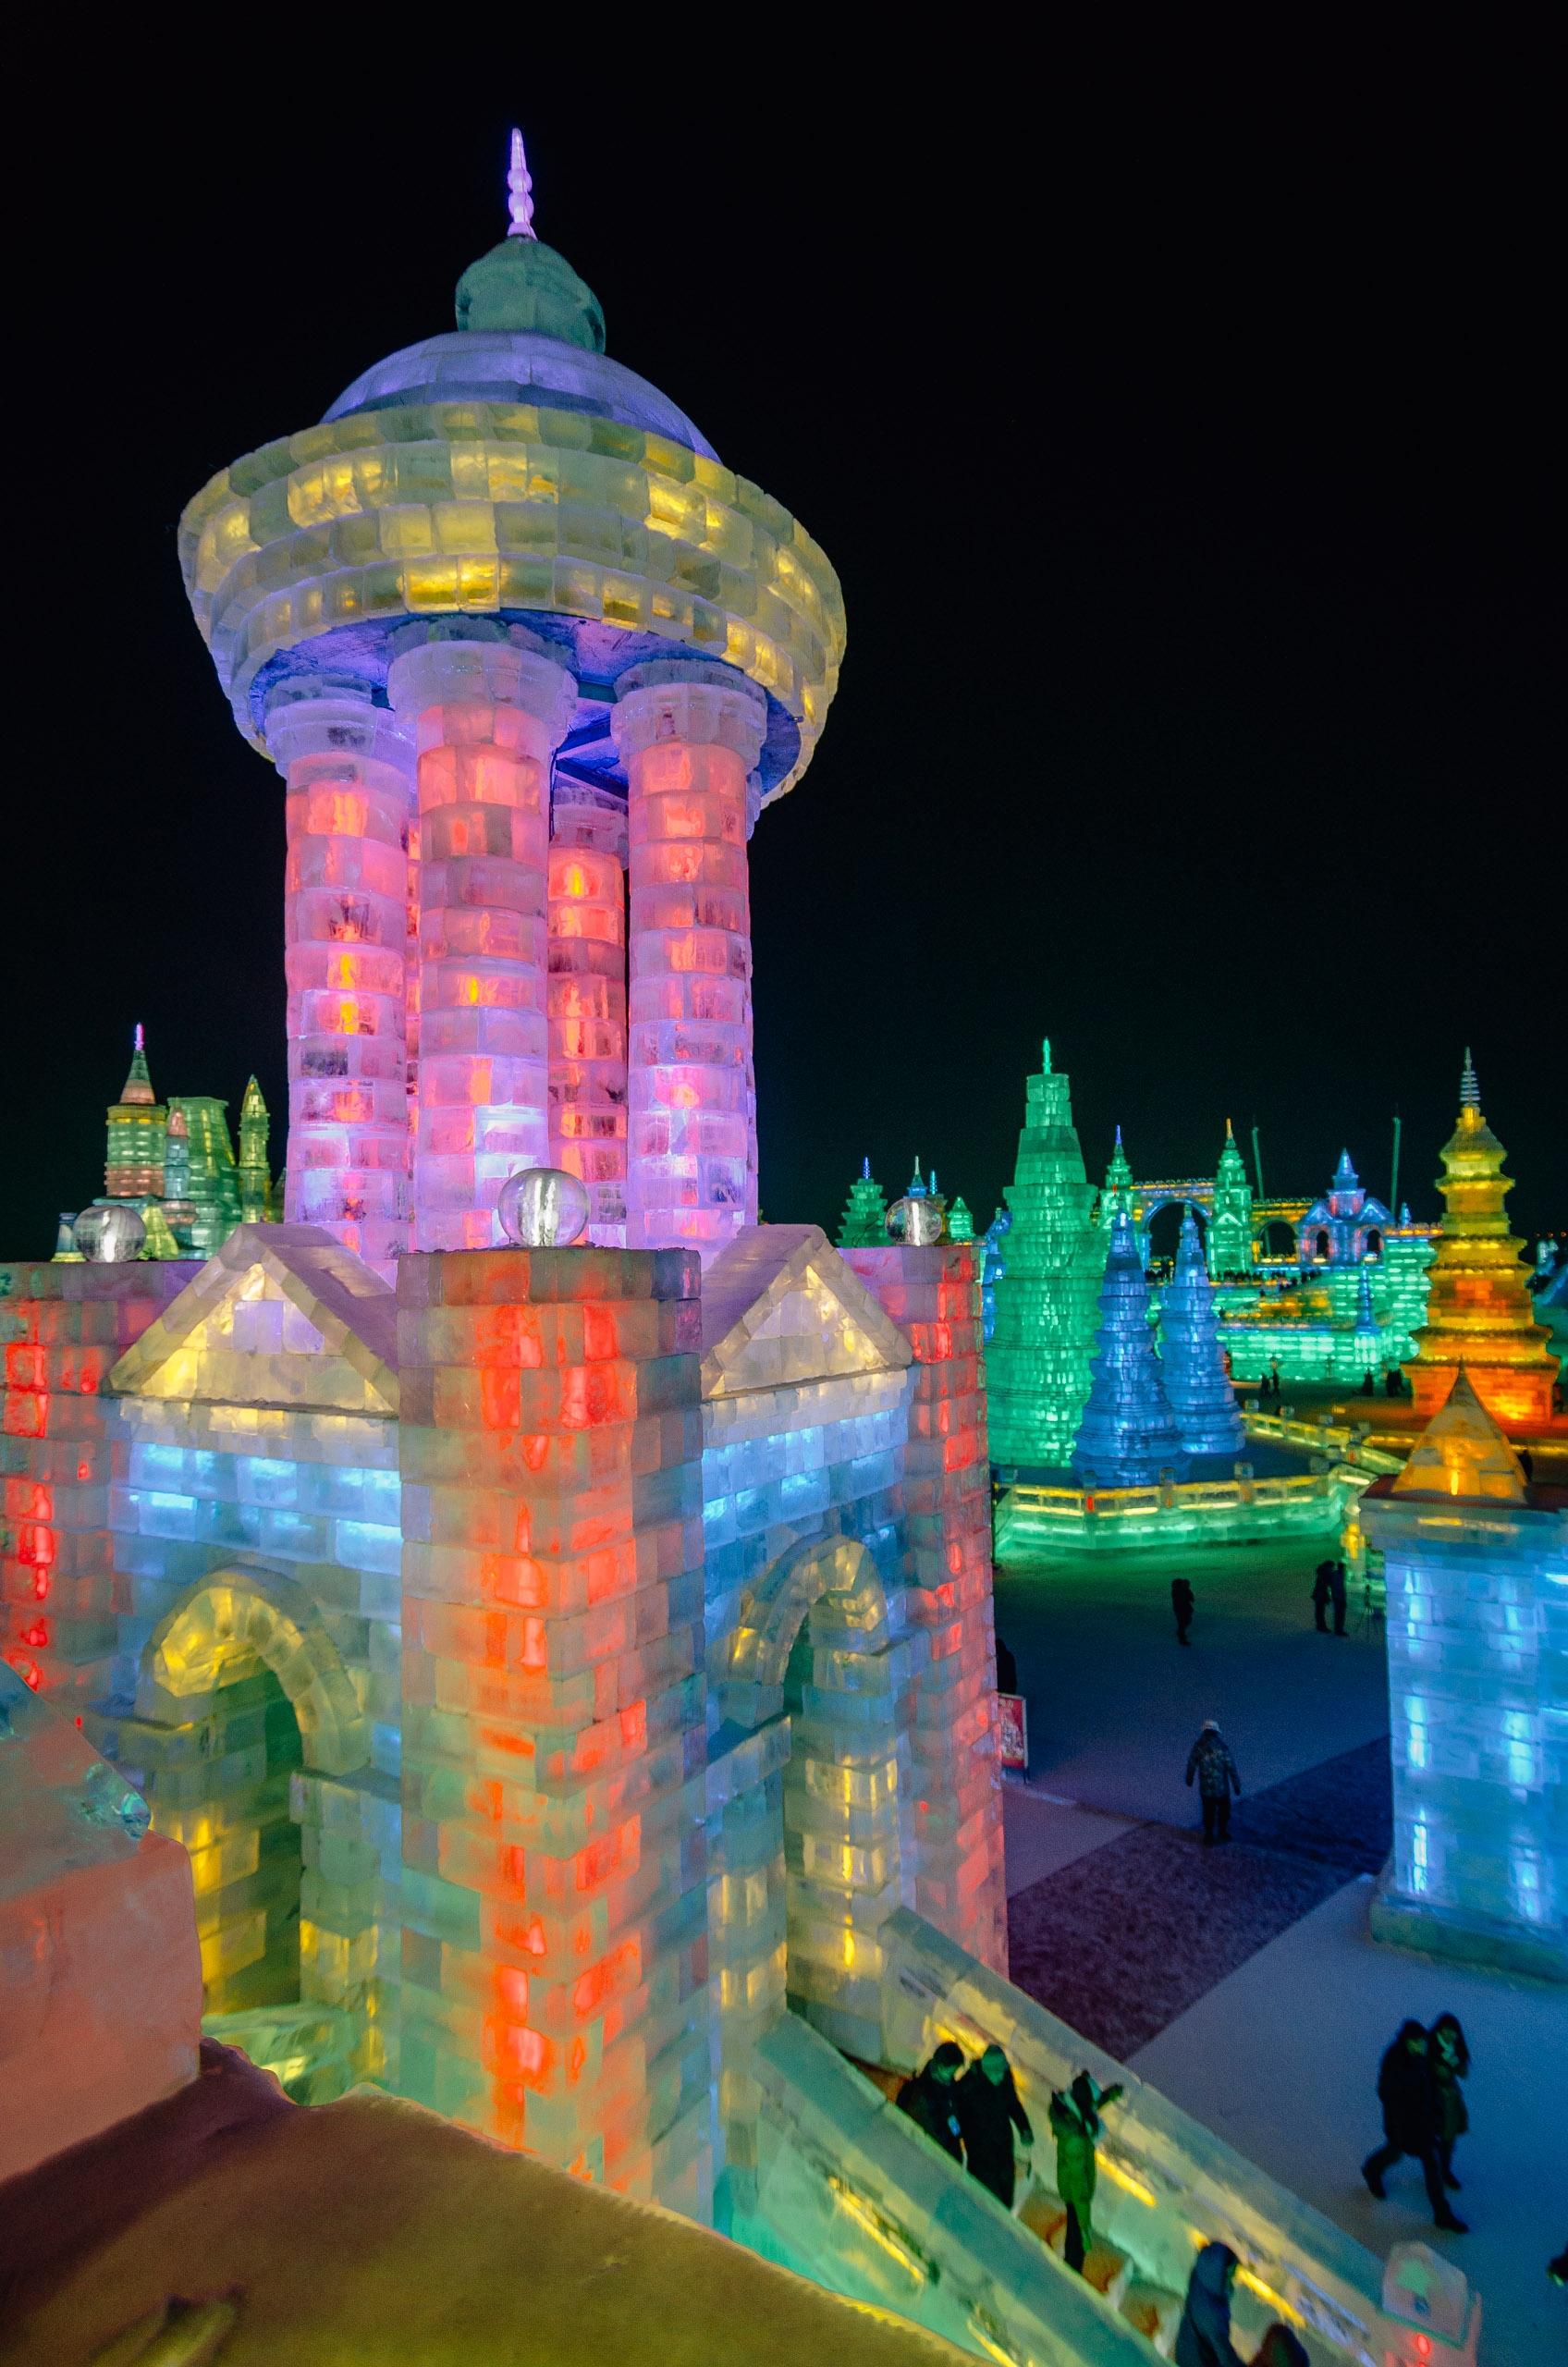 Harbin China Ice Festival - 2012-0108-DSC_2002